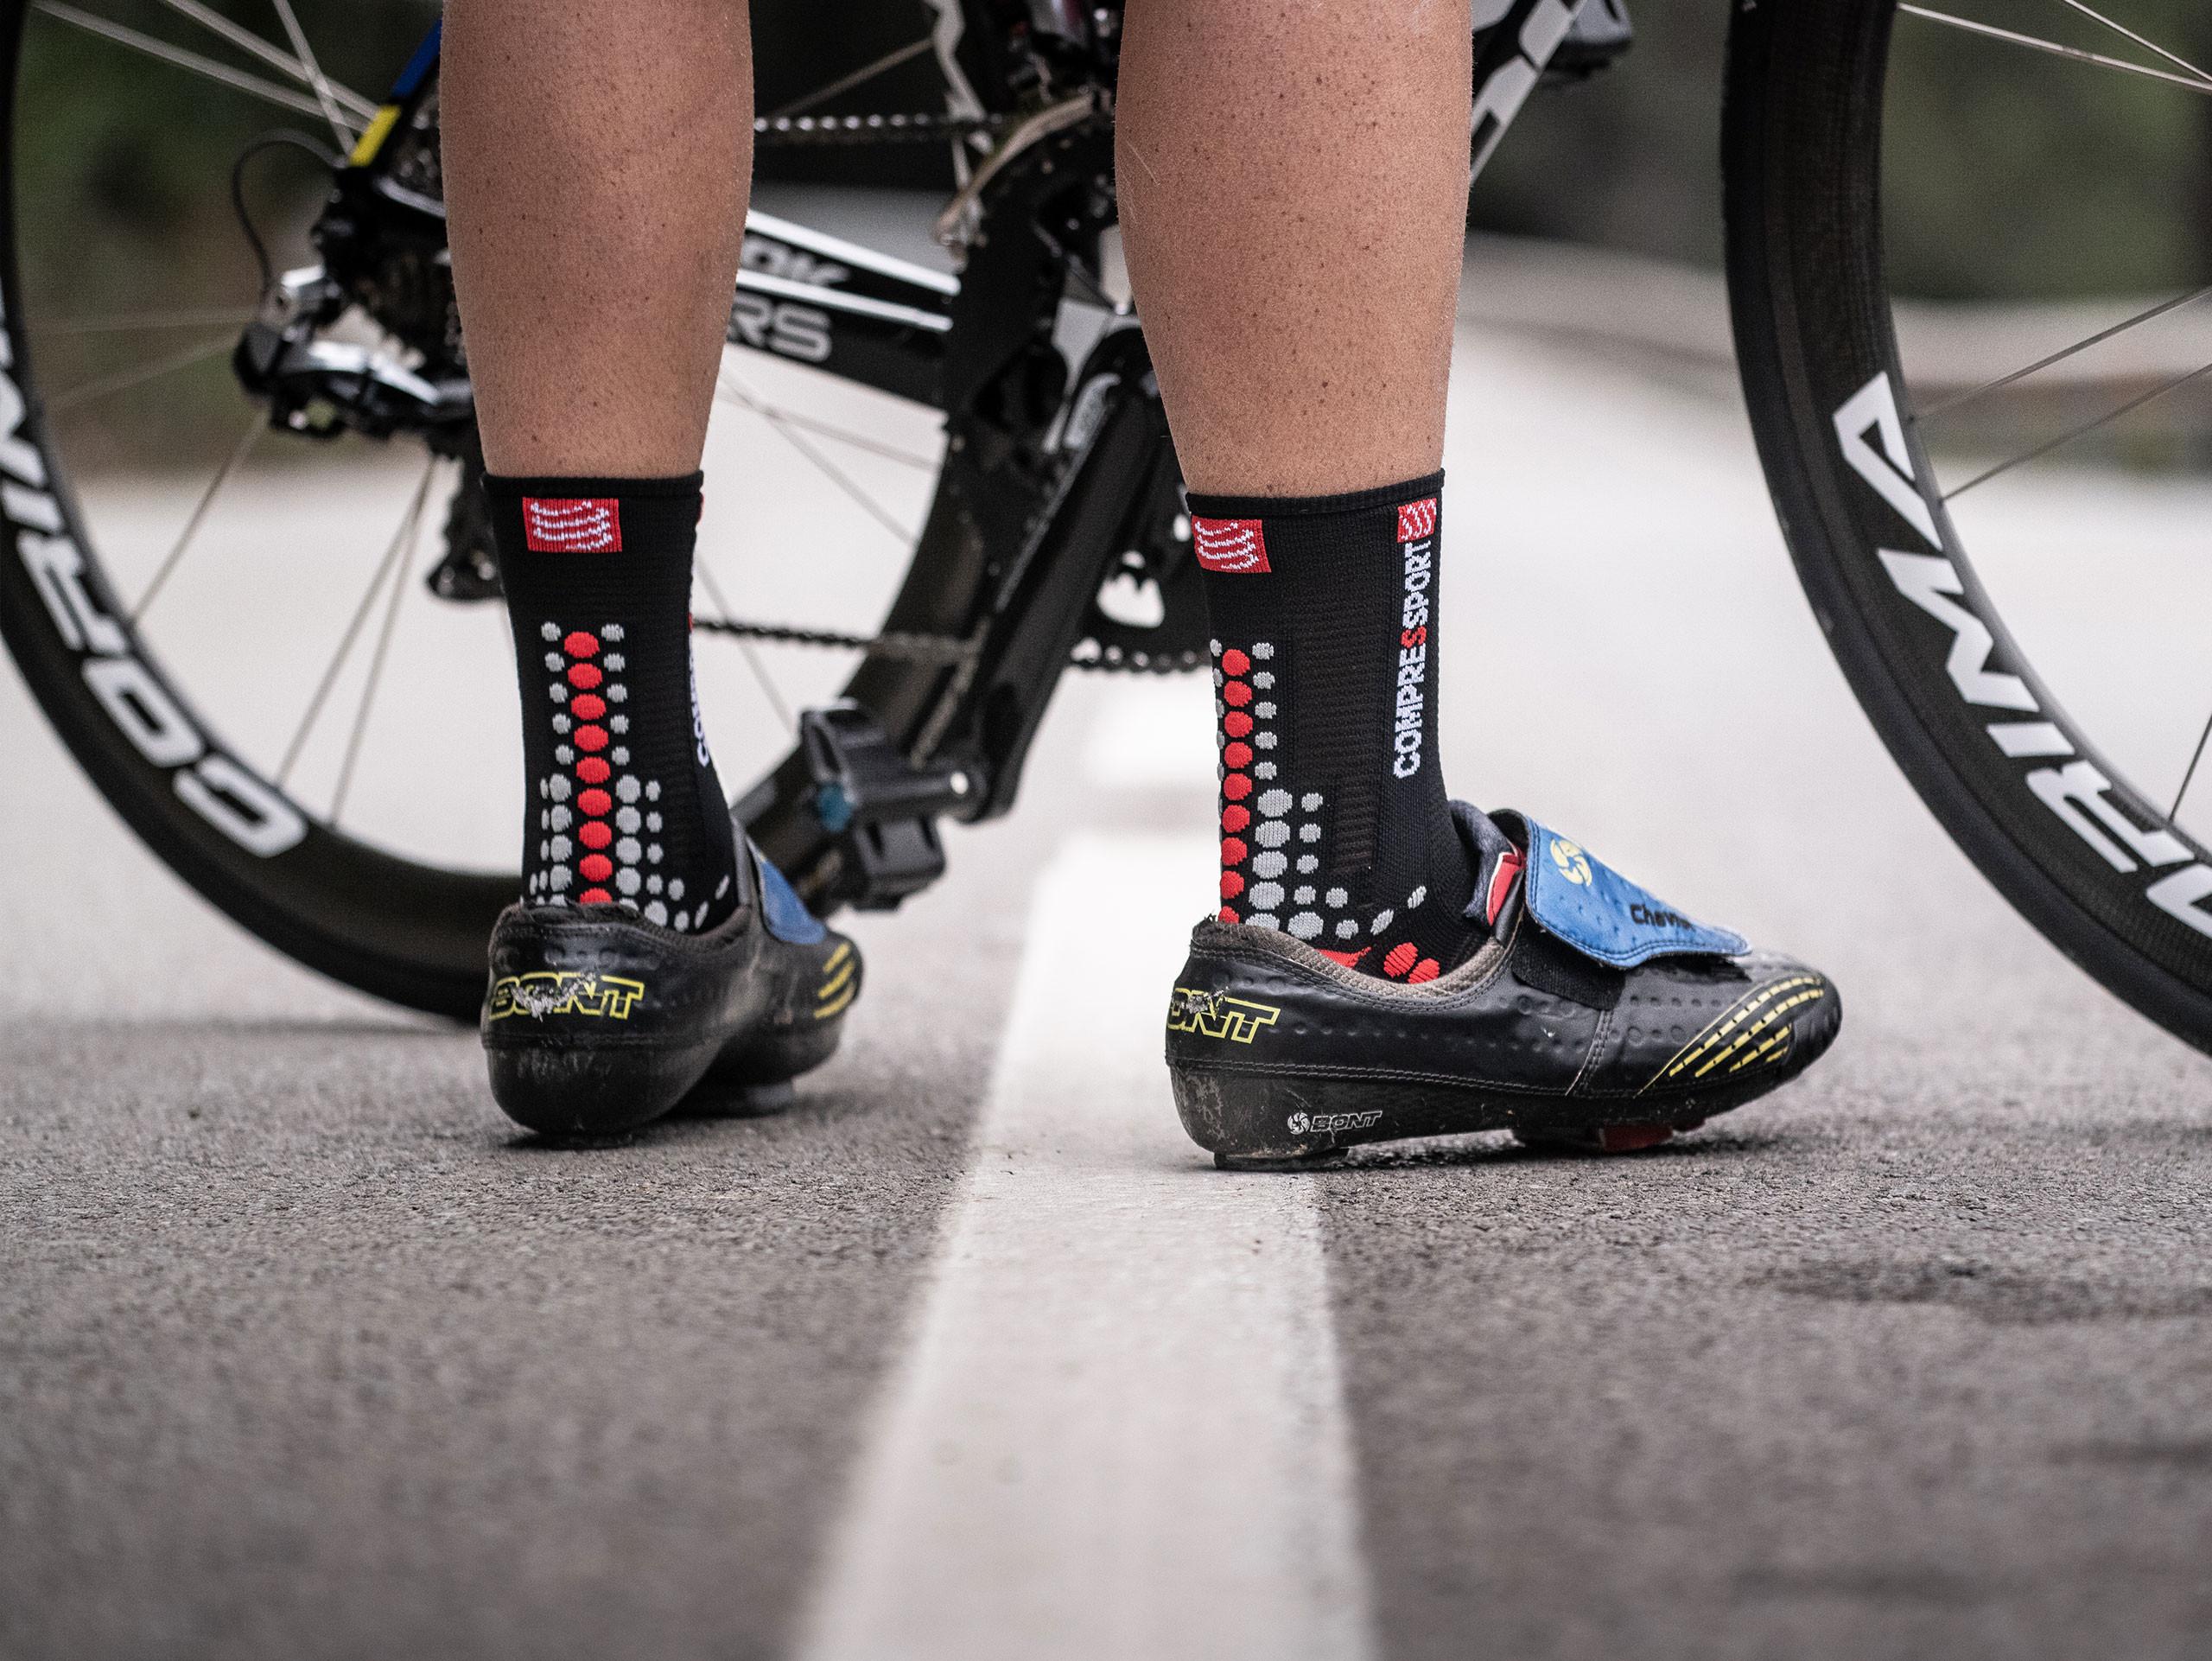 Pro racing socks v3.0 Bike schwarz/rot